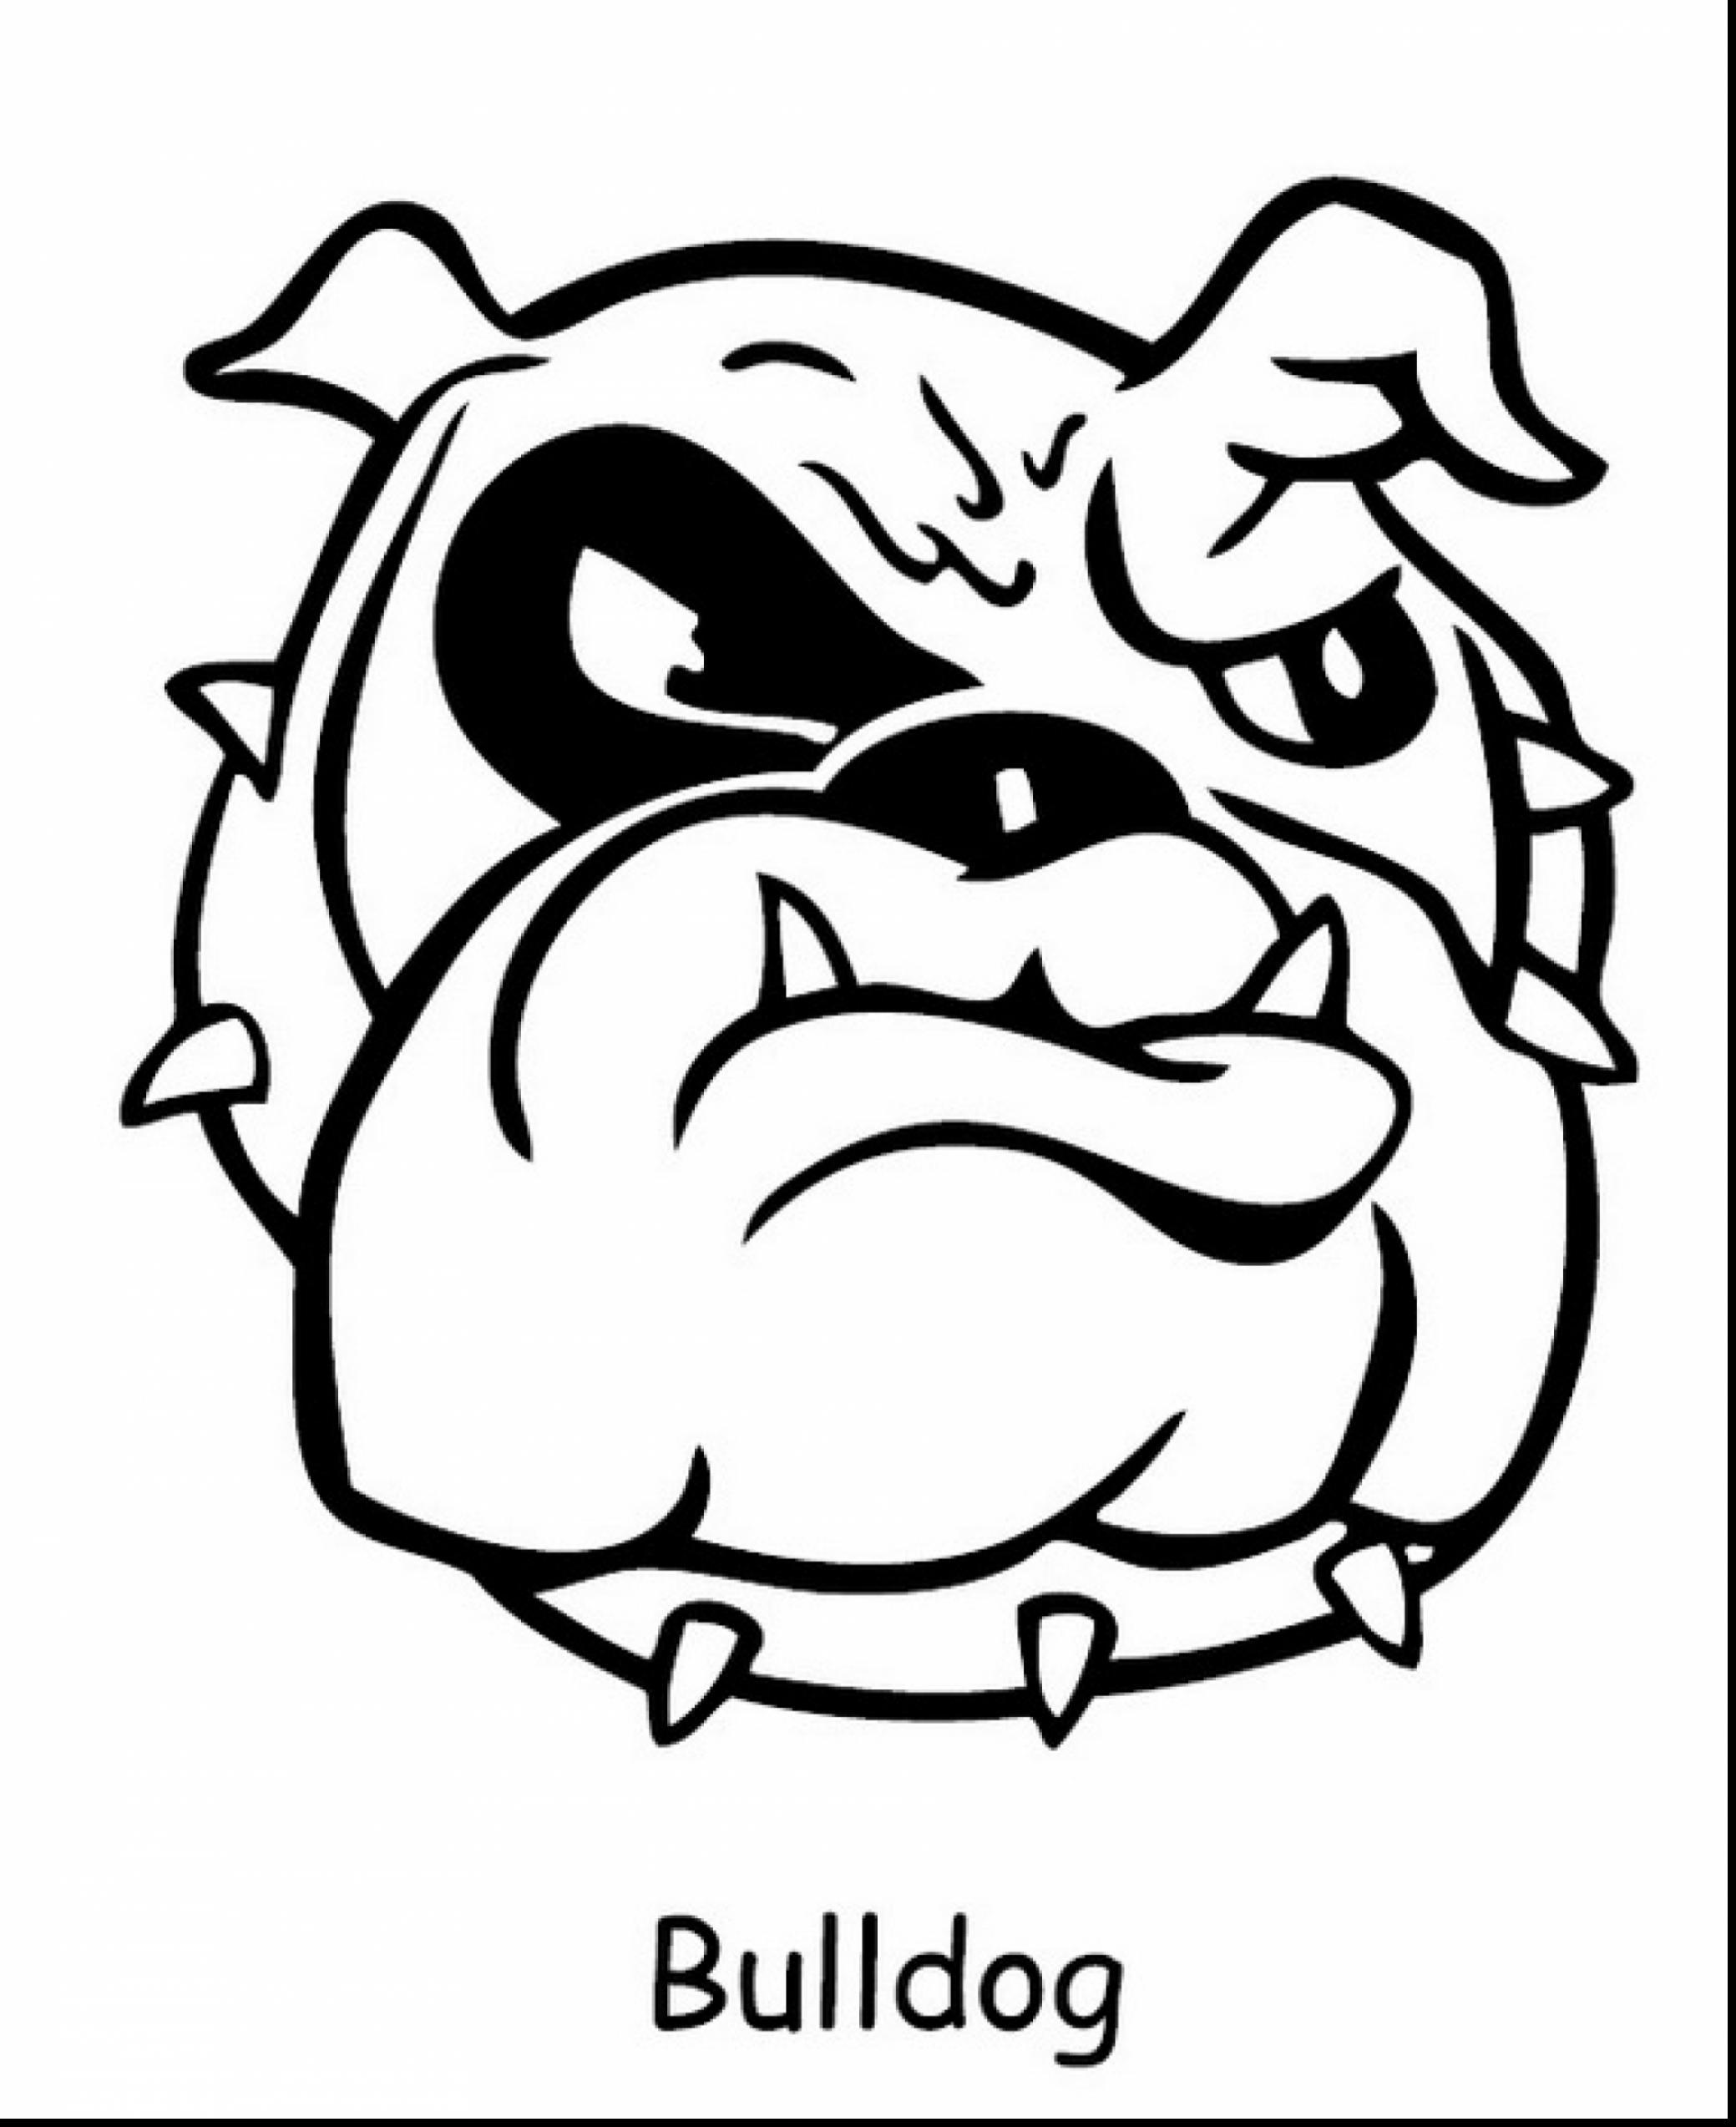 2079x2547 Bulldog Coloring Pages